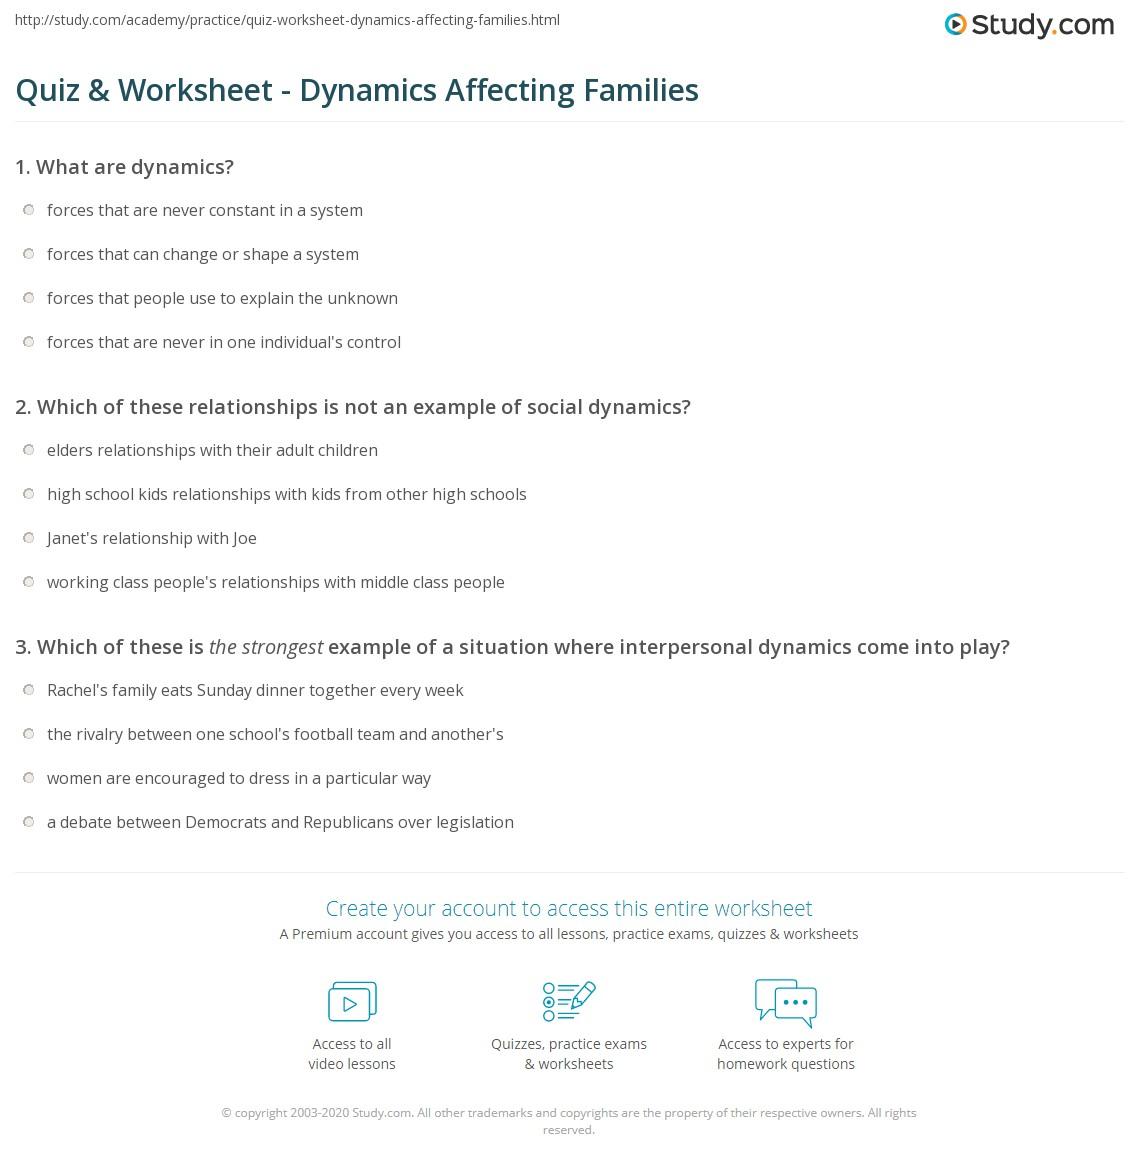 Quiz & Worksheet - Dynamics Affecting Families   Study.com